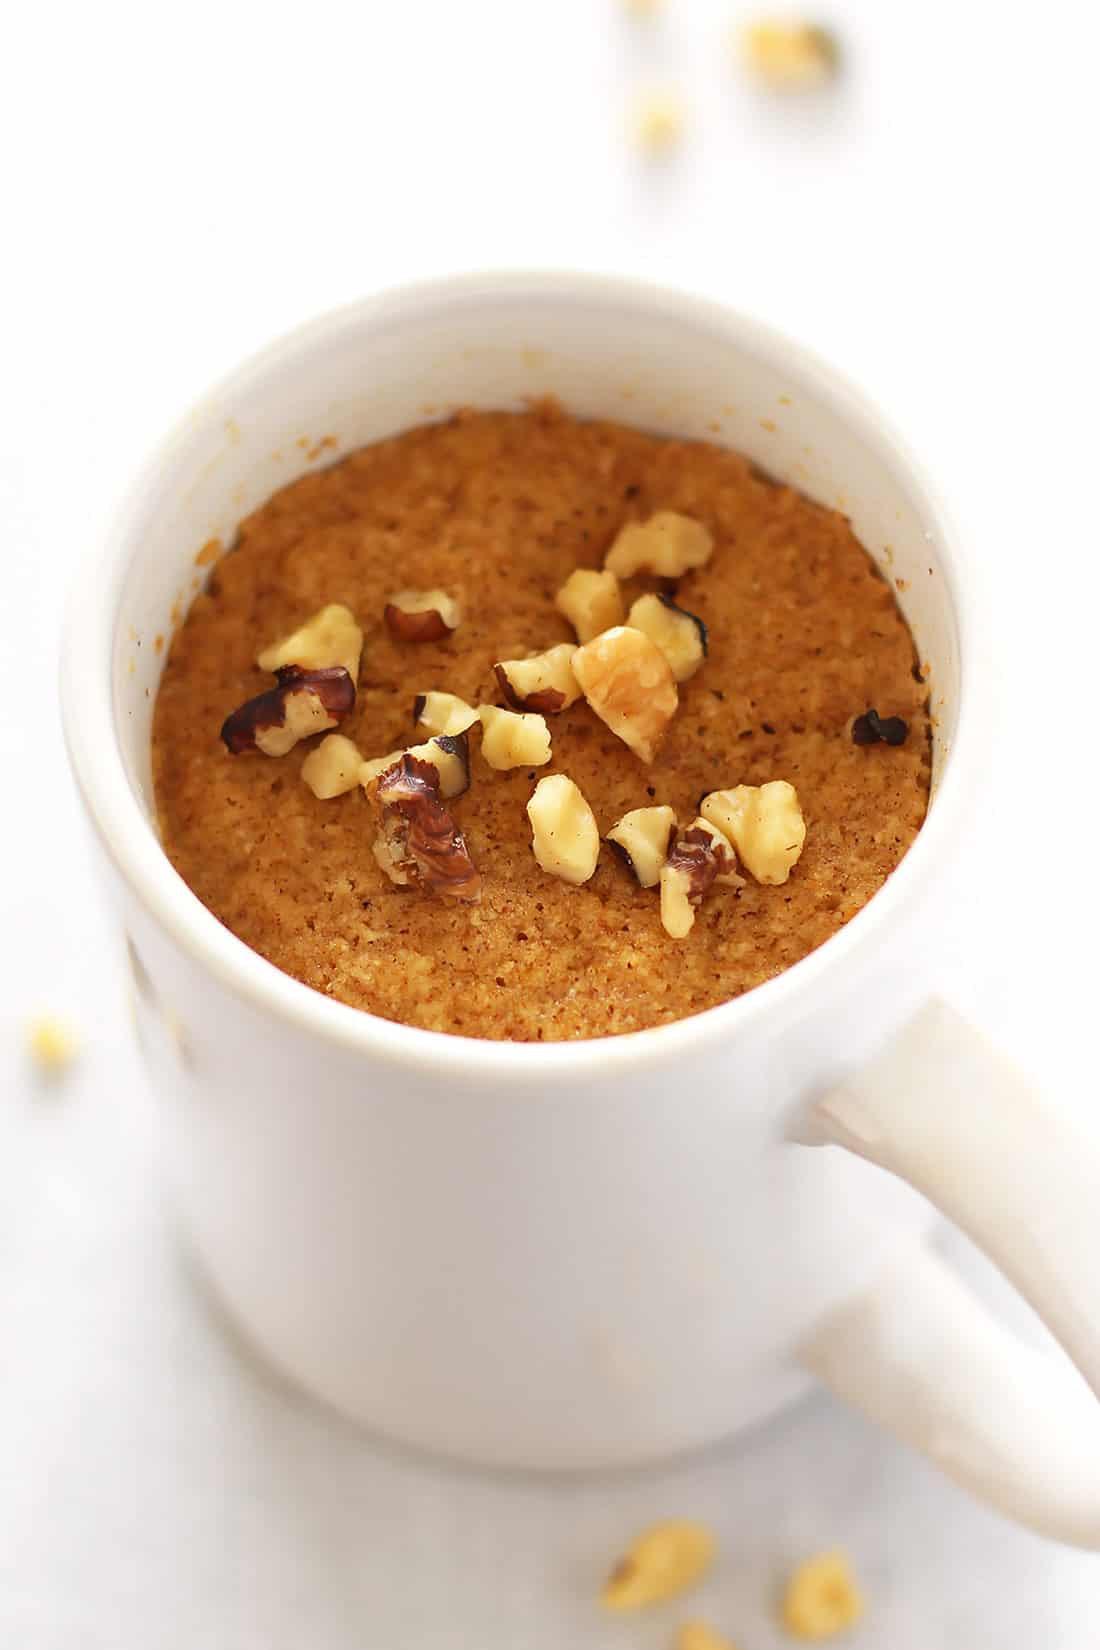 Paleo Pumpkin Mug Cake made with Coconut Flour - Leelalicious